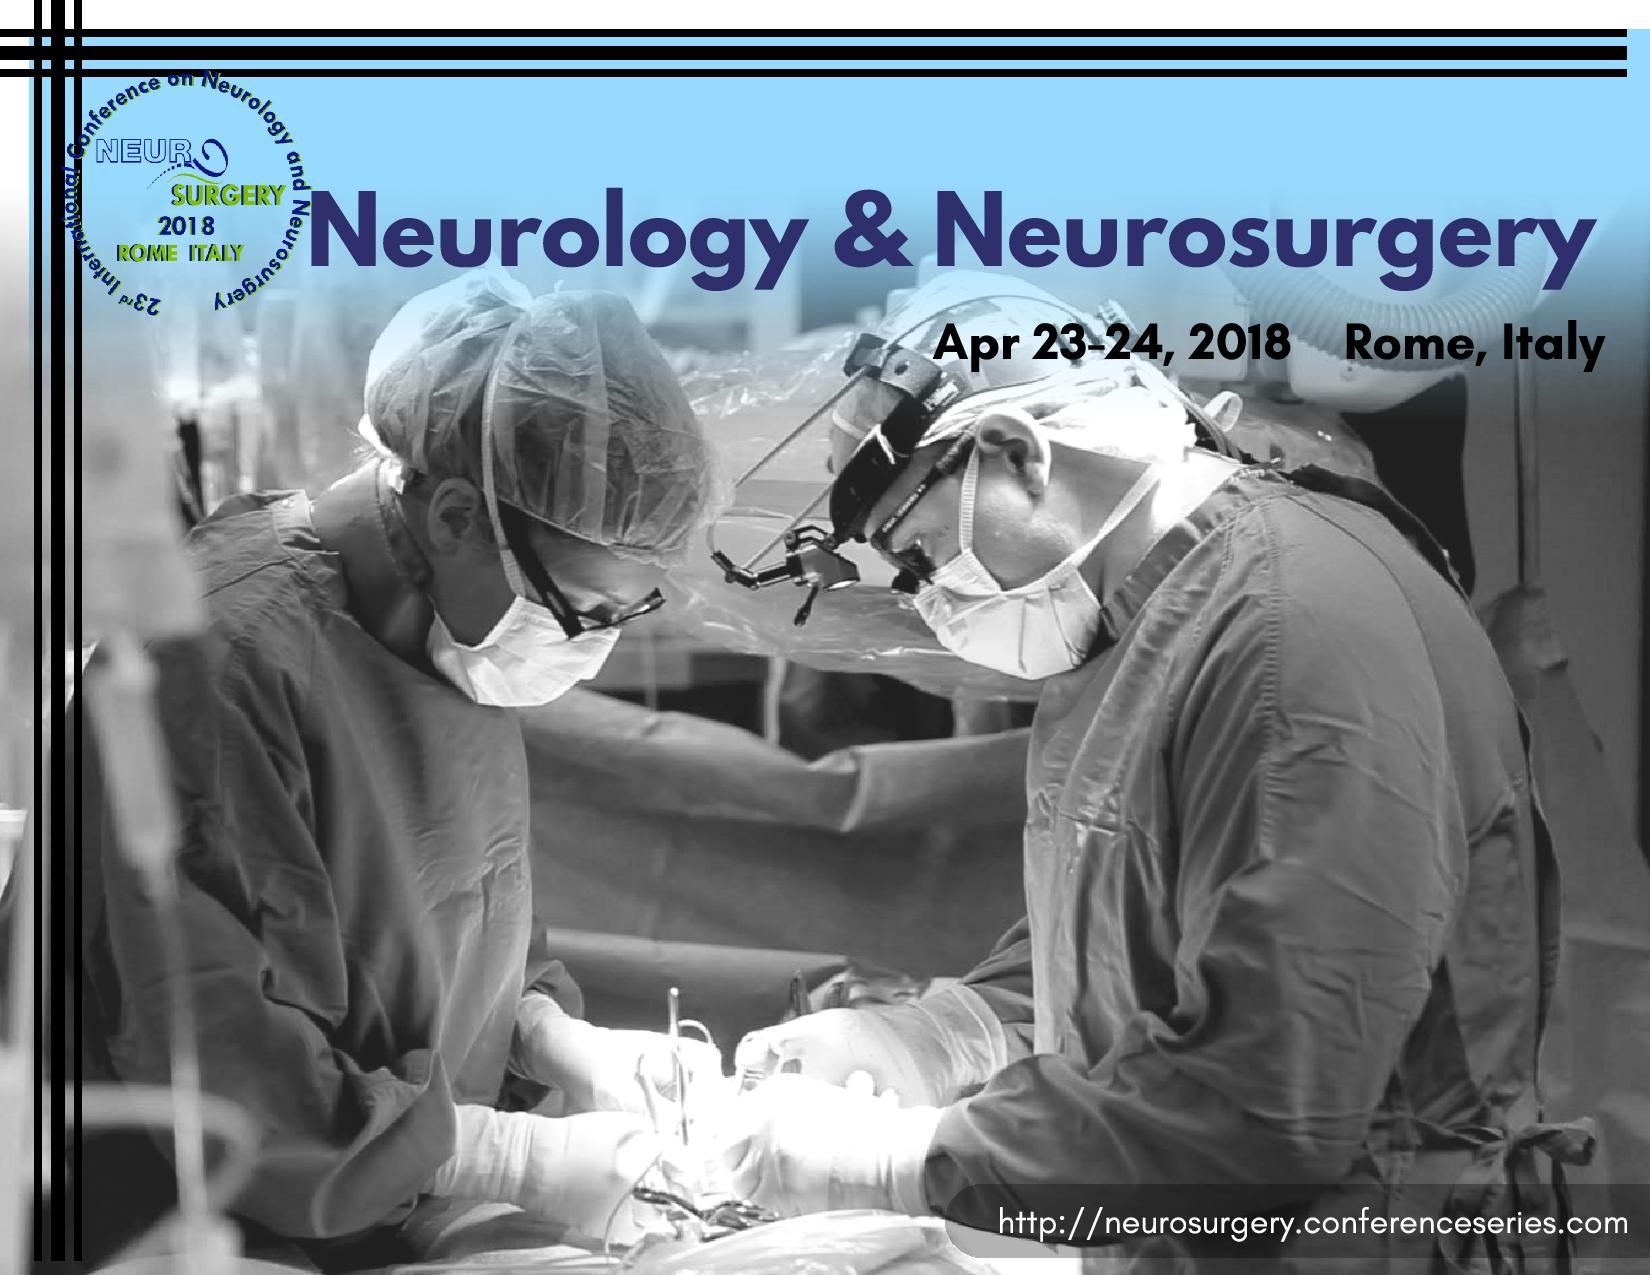 23rd International Conference on #Neurology & #Neurosurgery